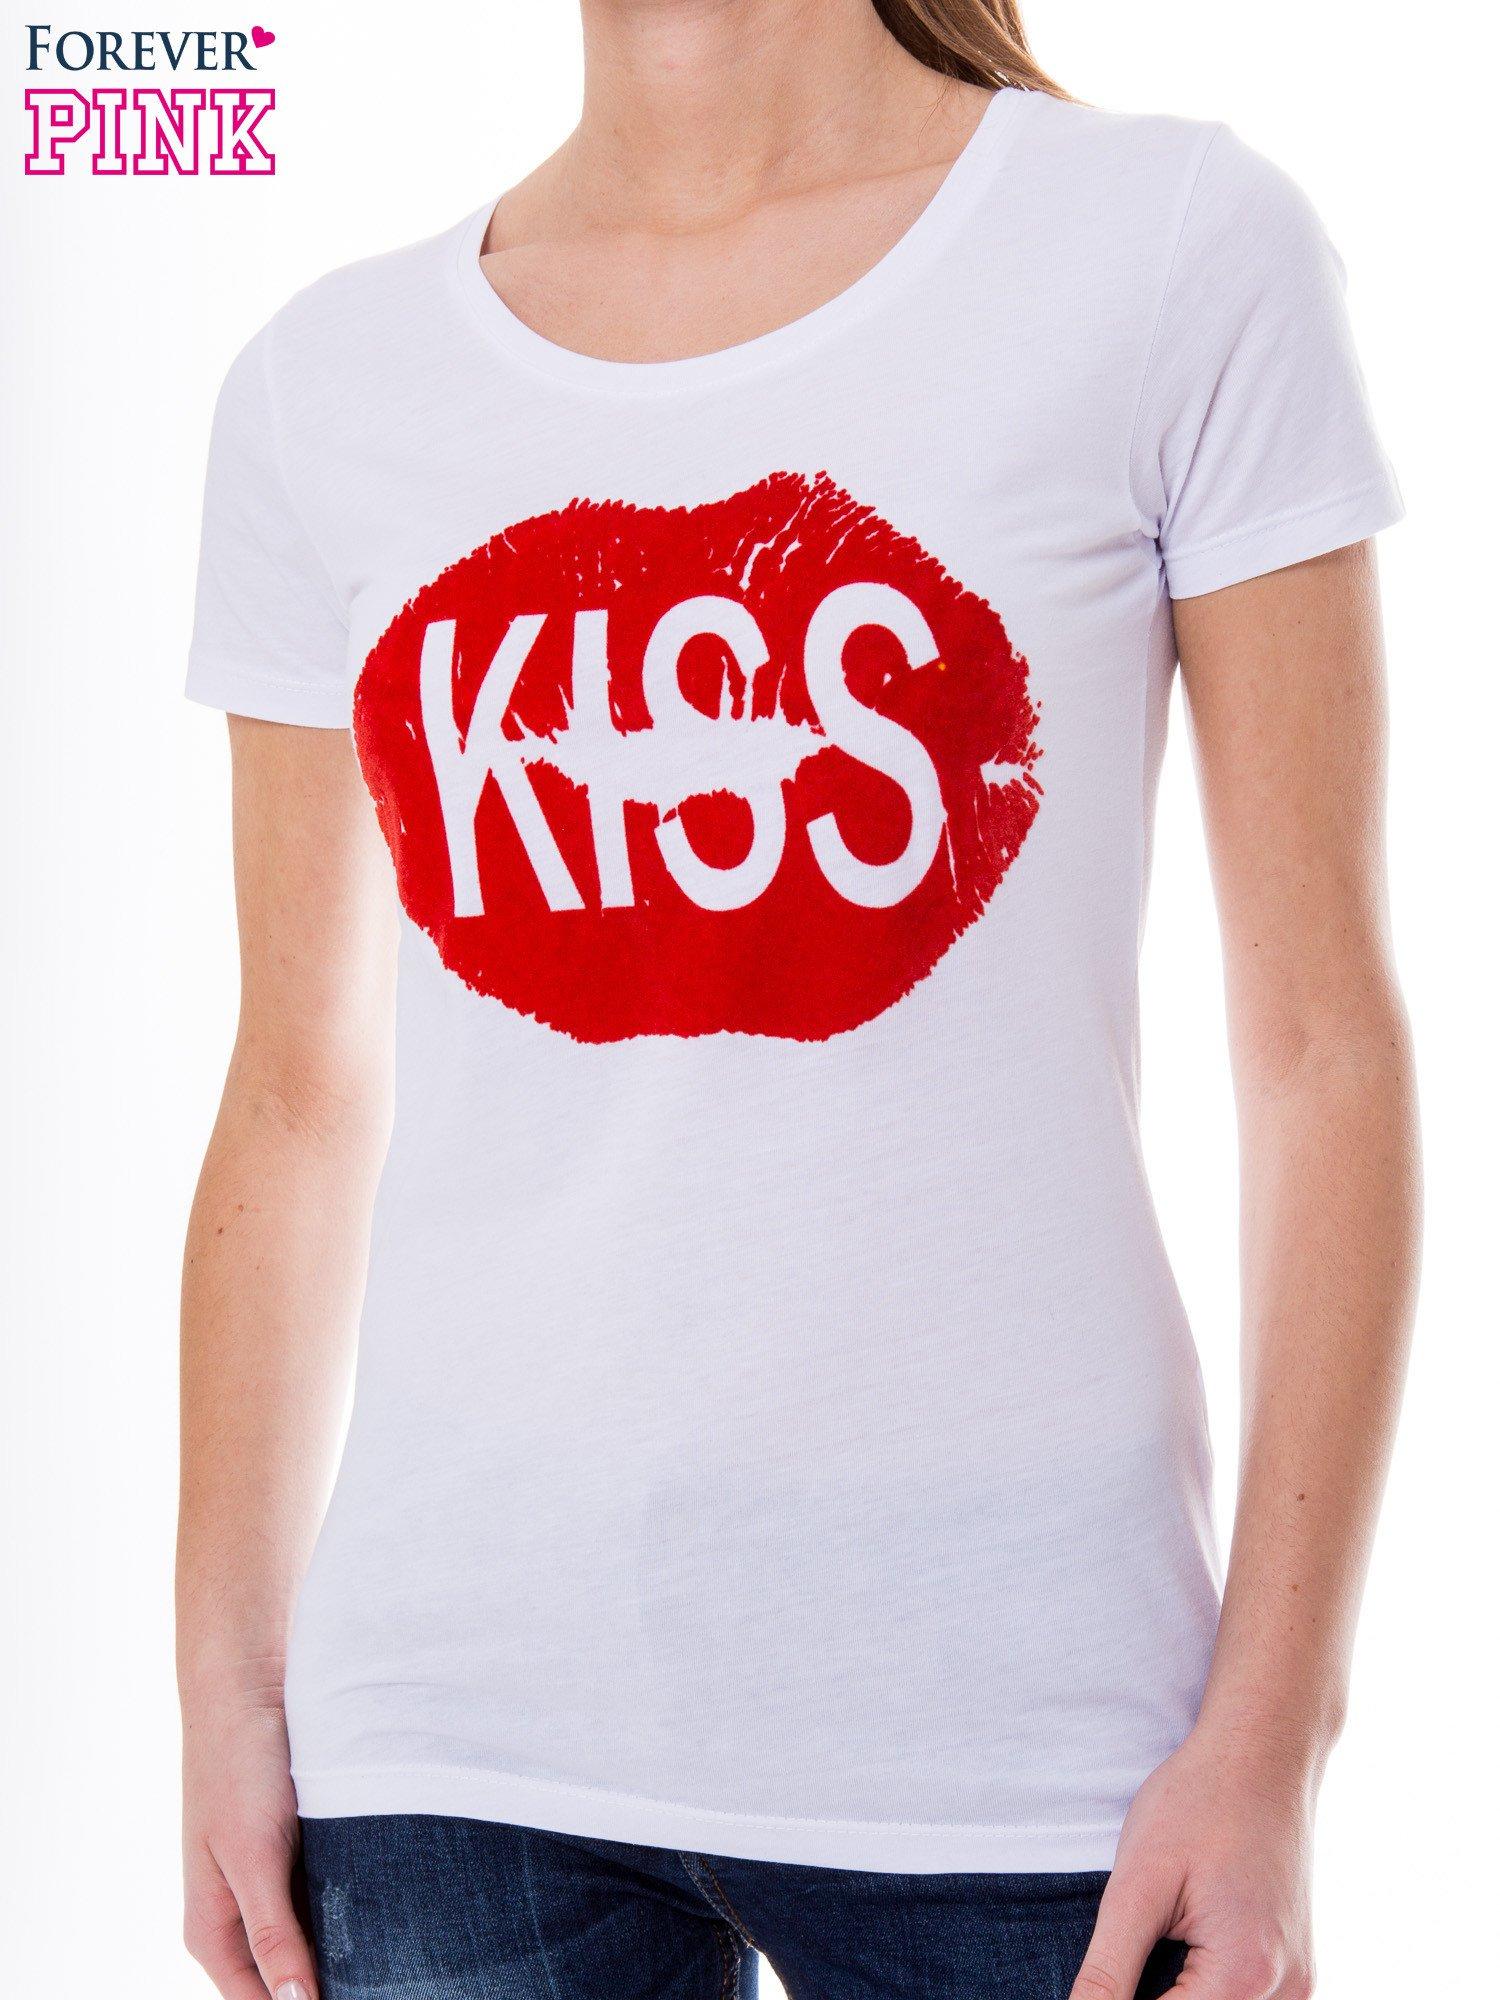 Biały t-shirt z nadrukiem ust KISS                                  zdj.                                  5